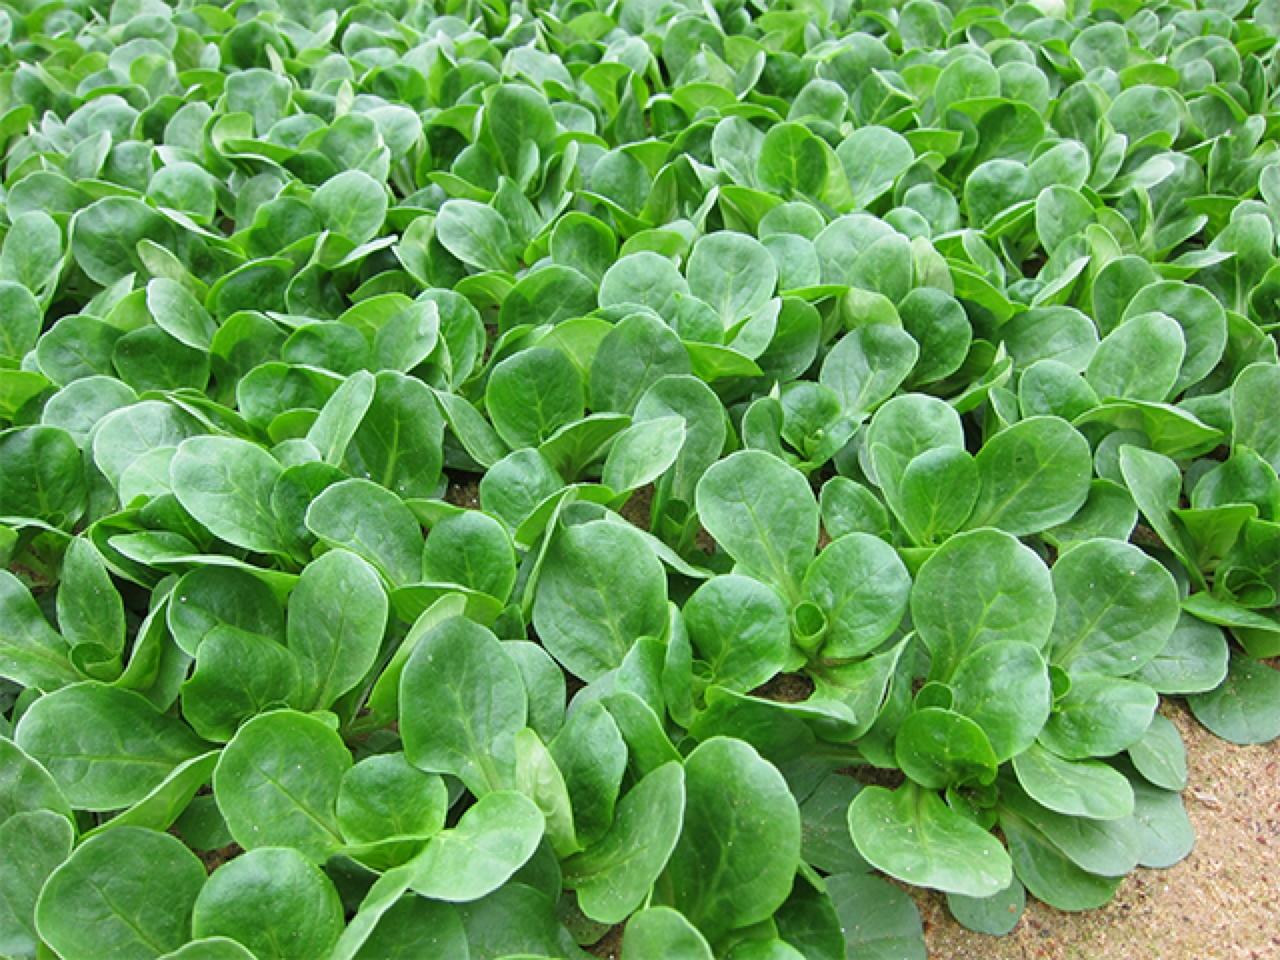 Dolcetta o valerianella Amely - Plantgest.com